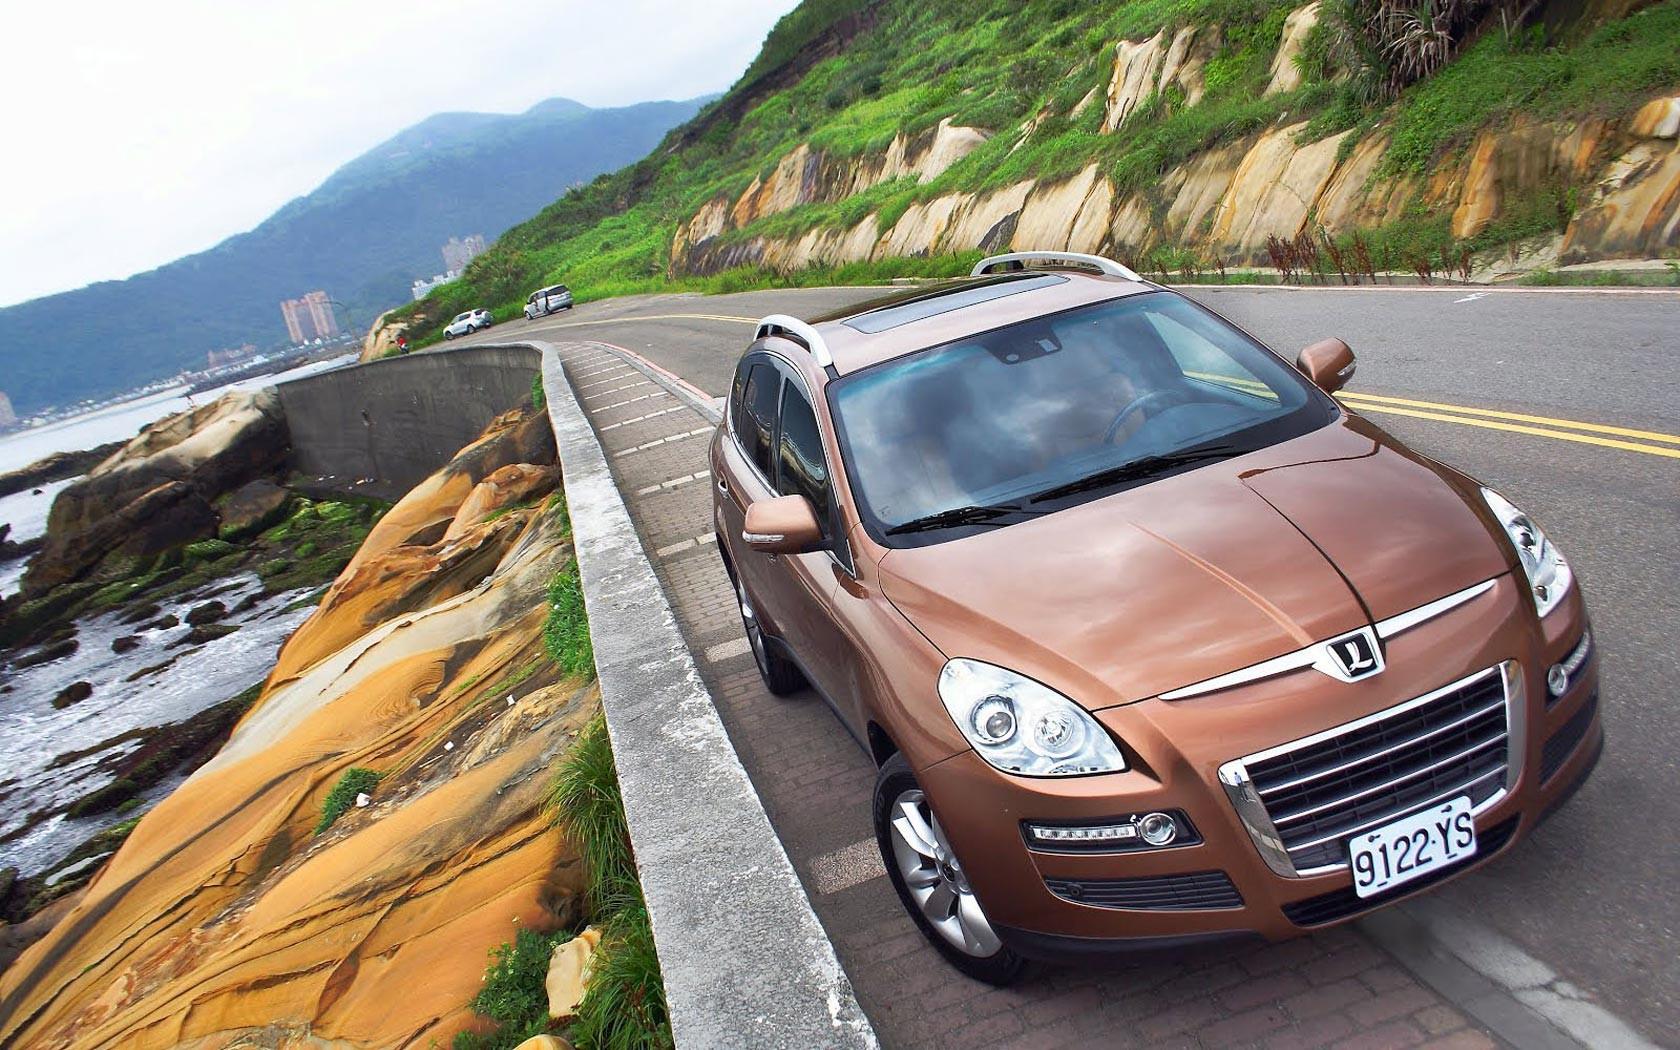 Мицубиси Аутлендер 2016 отзывы владельцев об автомобиле